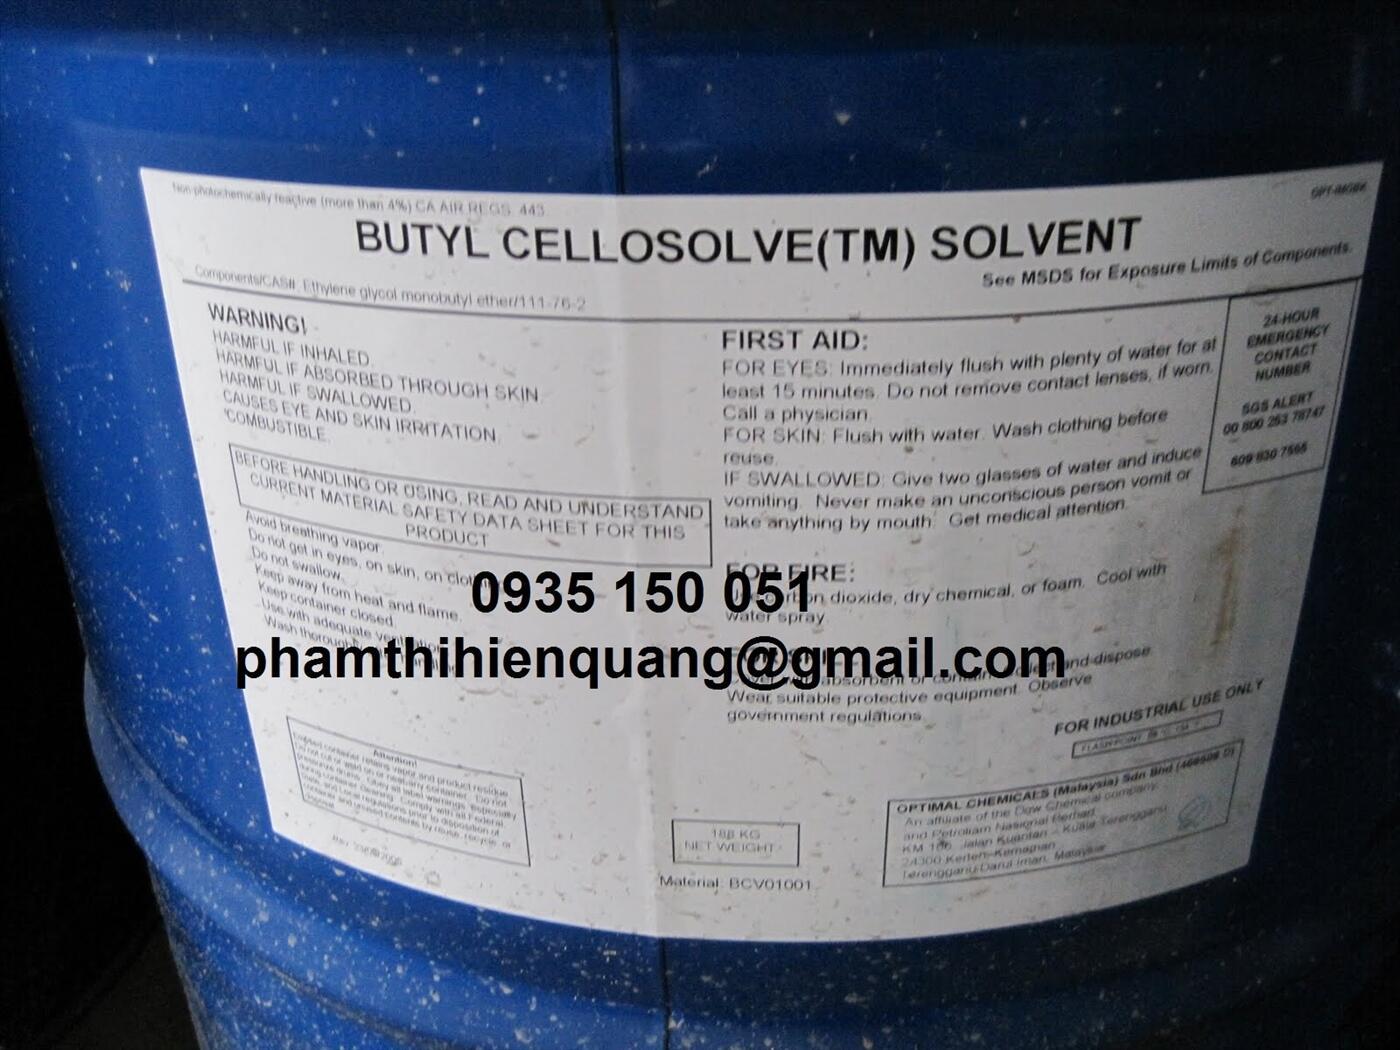 Butyl cellosollve (BCS)_C6H14O